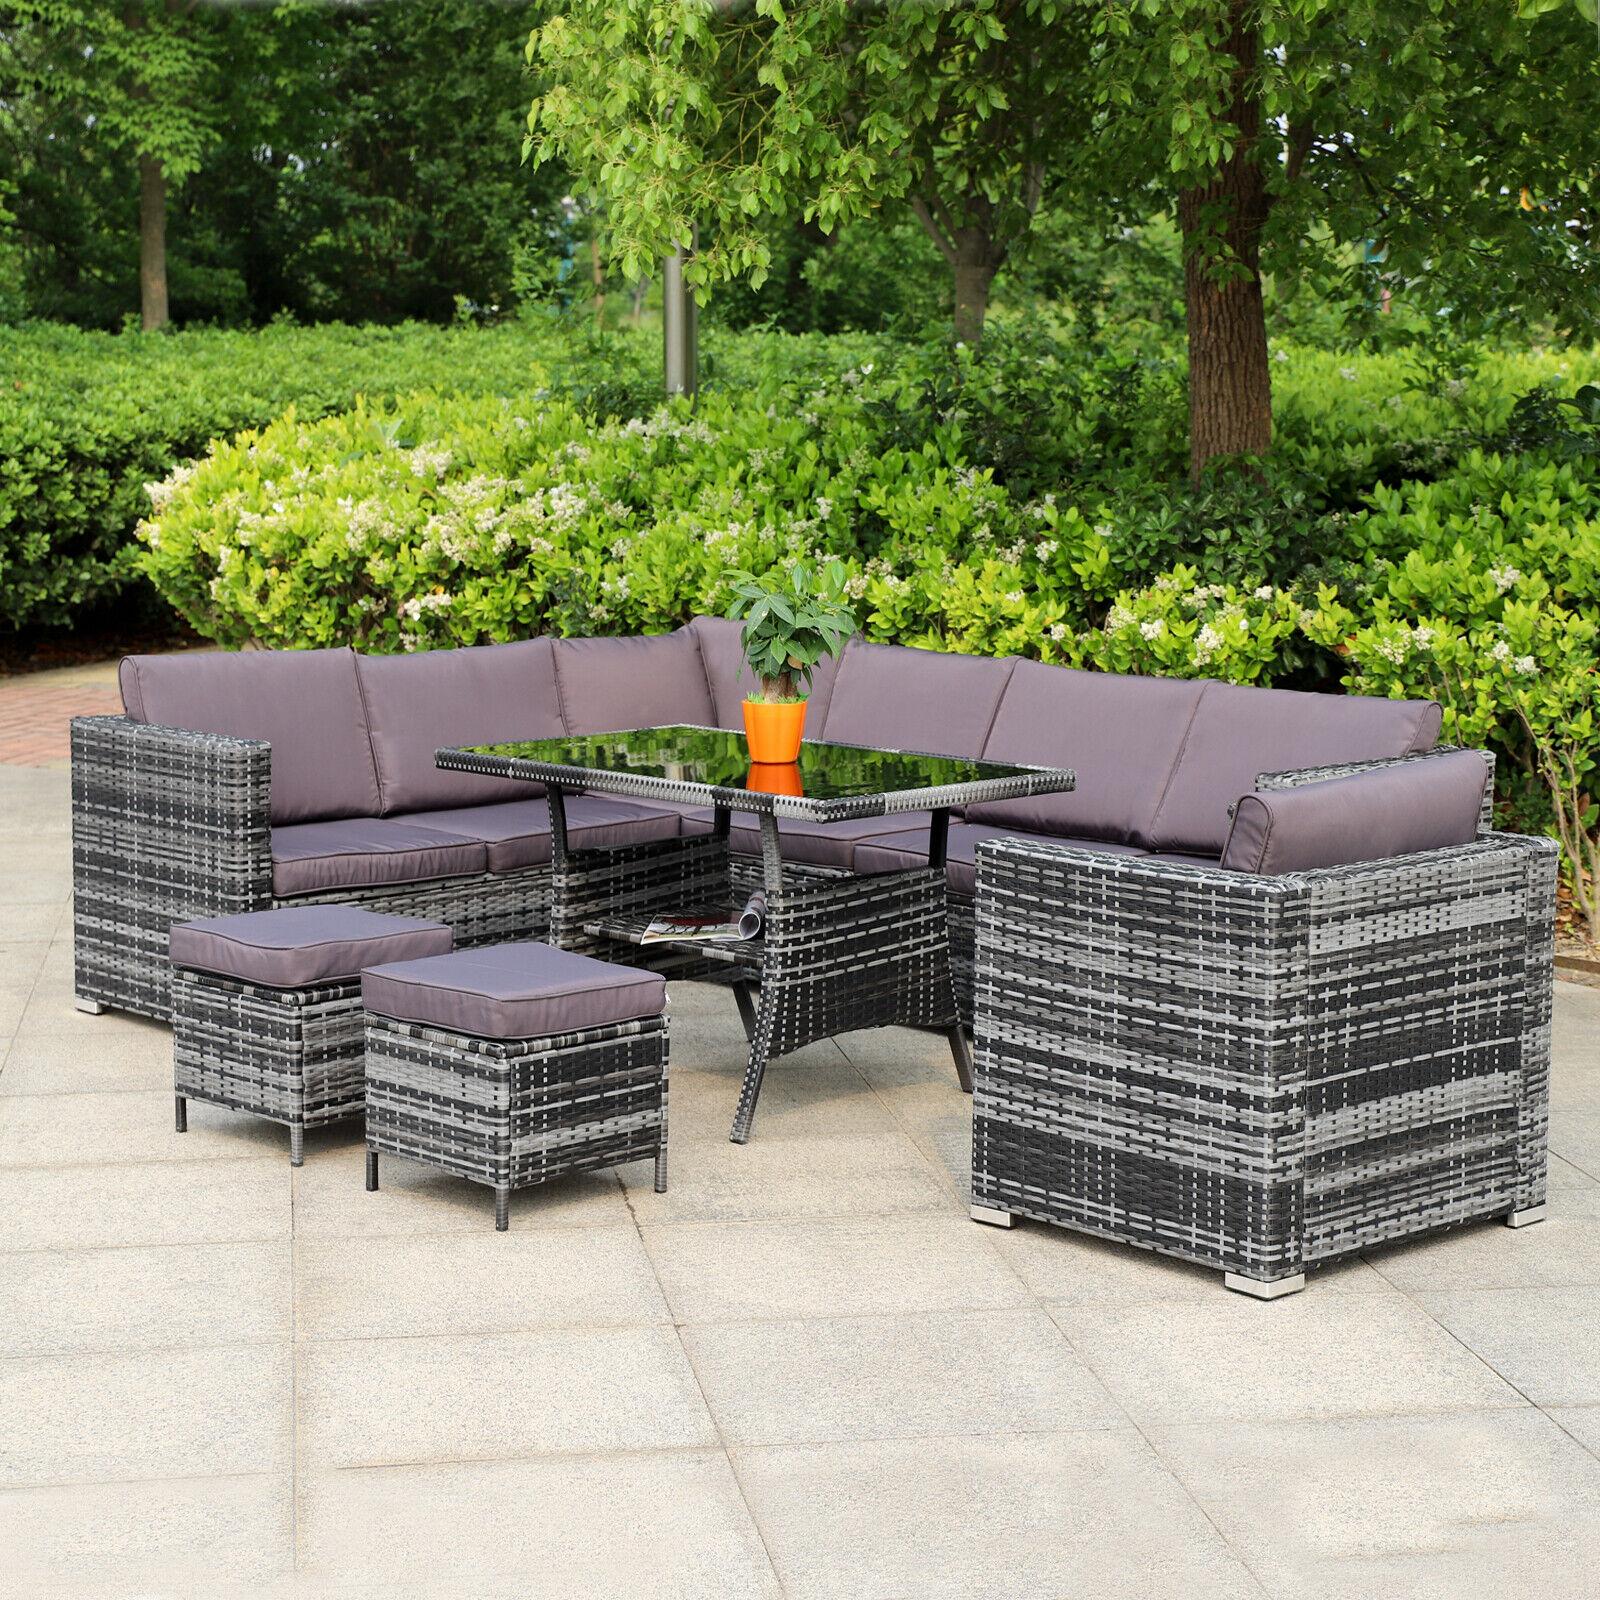 Garden Furniture - Grey Corner Rattan Dining Sofa Set Garden Patio 10 Seater Furniture Settee